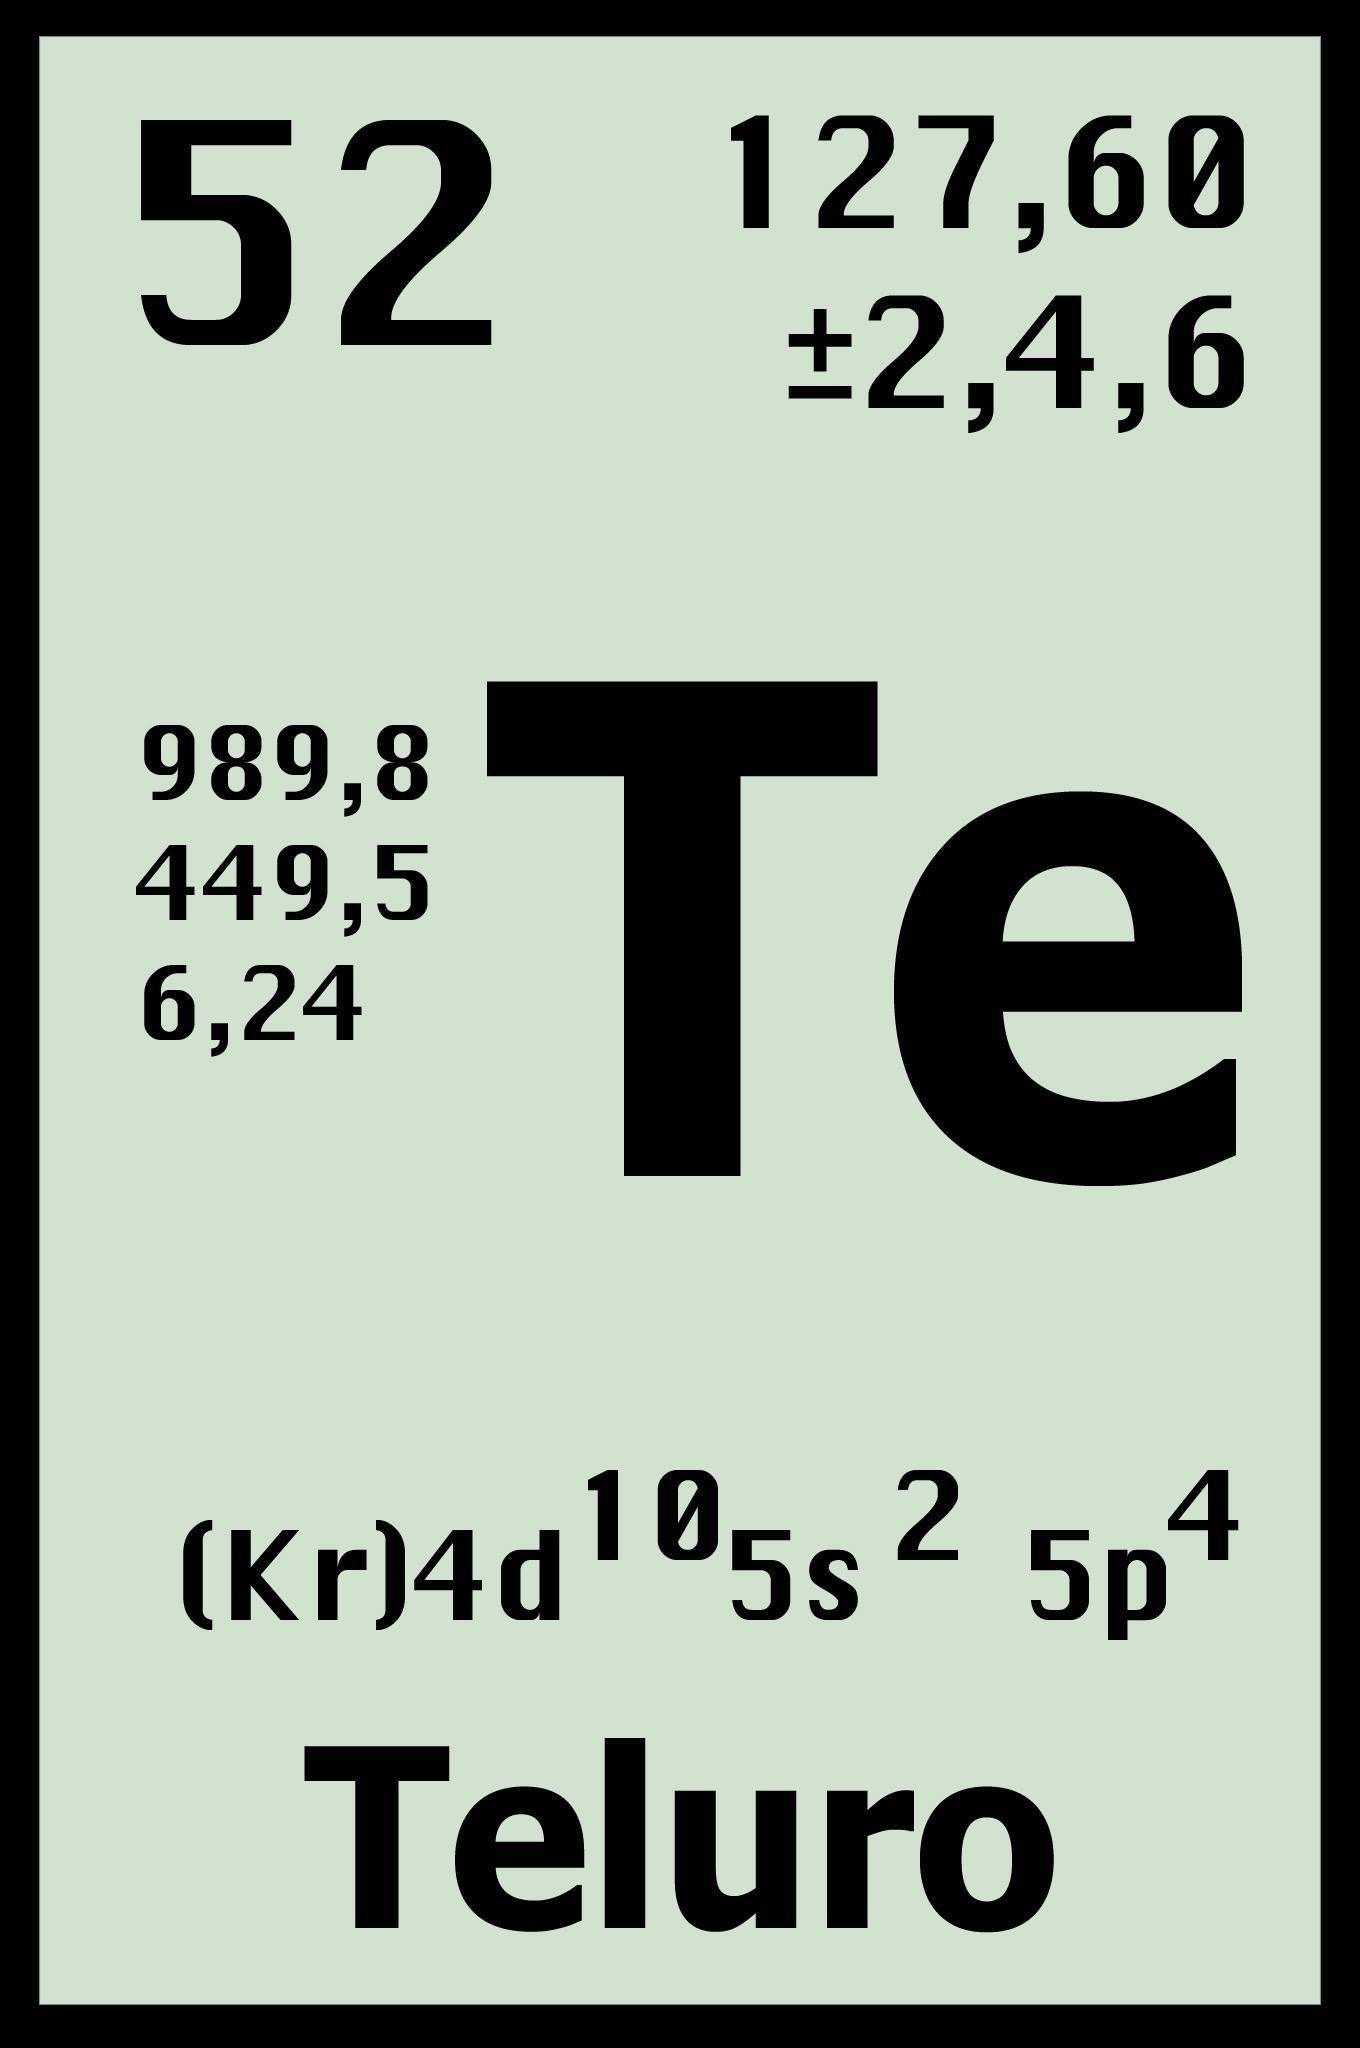 Telurio elemento tabla periodica cerca amb google qe pinterest telurio elemento tabla periodica cerca amb google urtaz Image collections